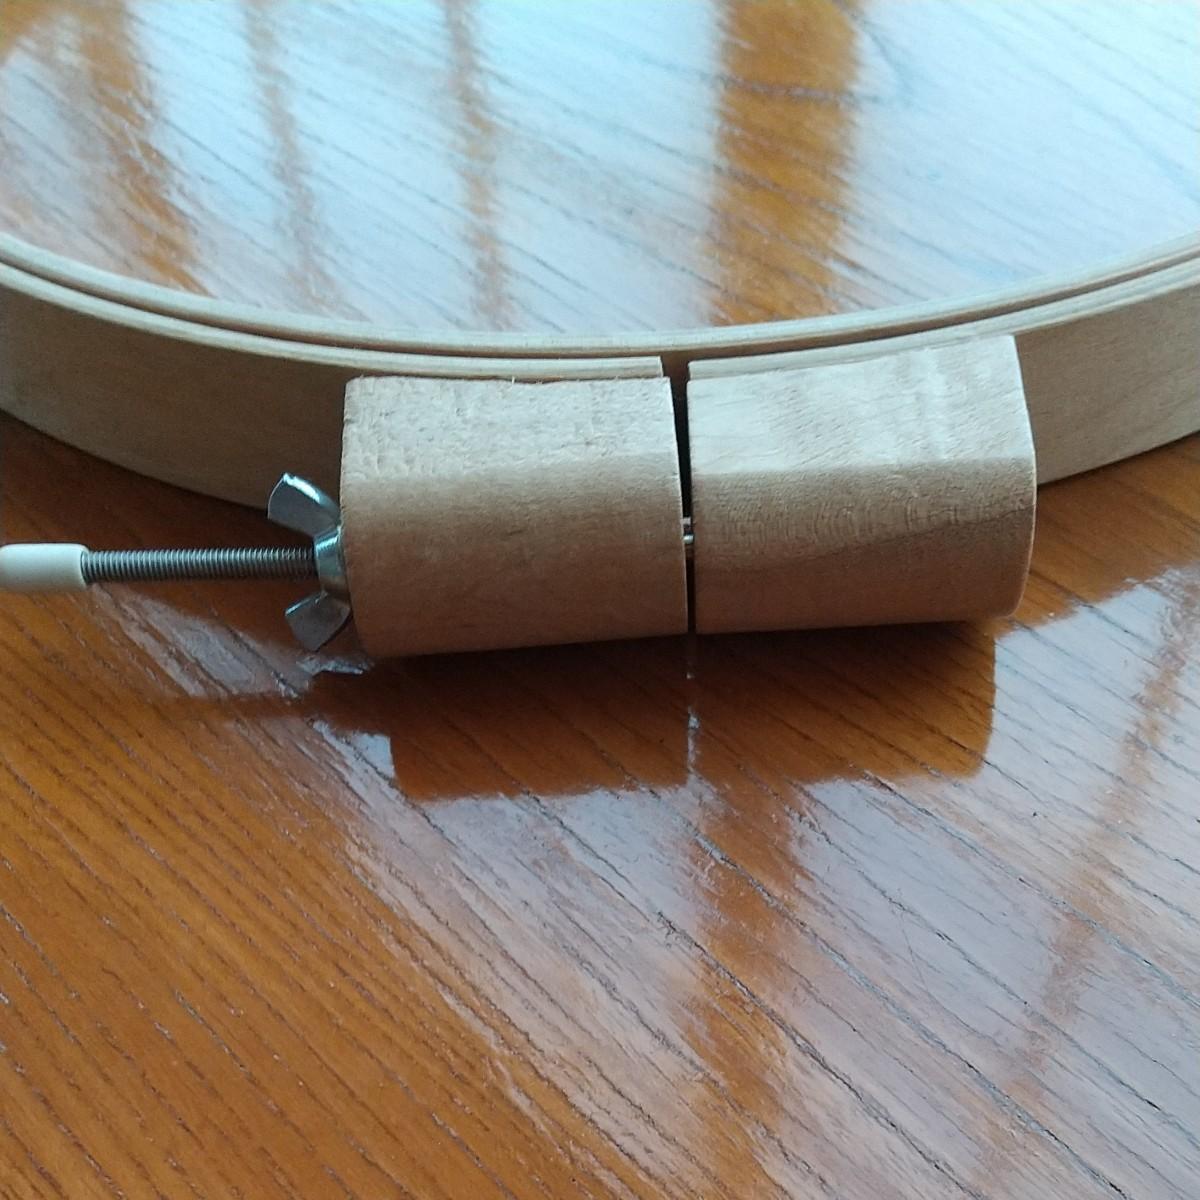 clover キルティングフープ 小 30cm 片面接着キルト芯 ハギレ